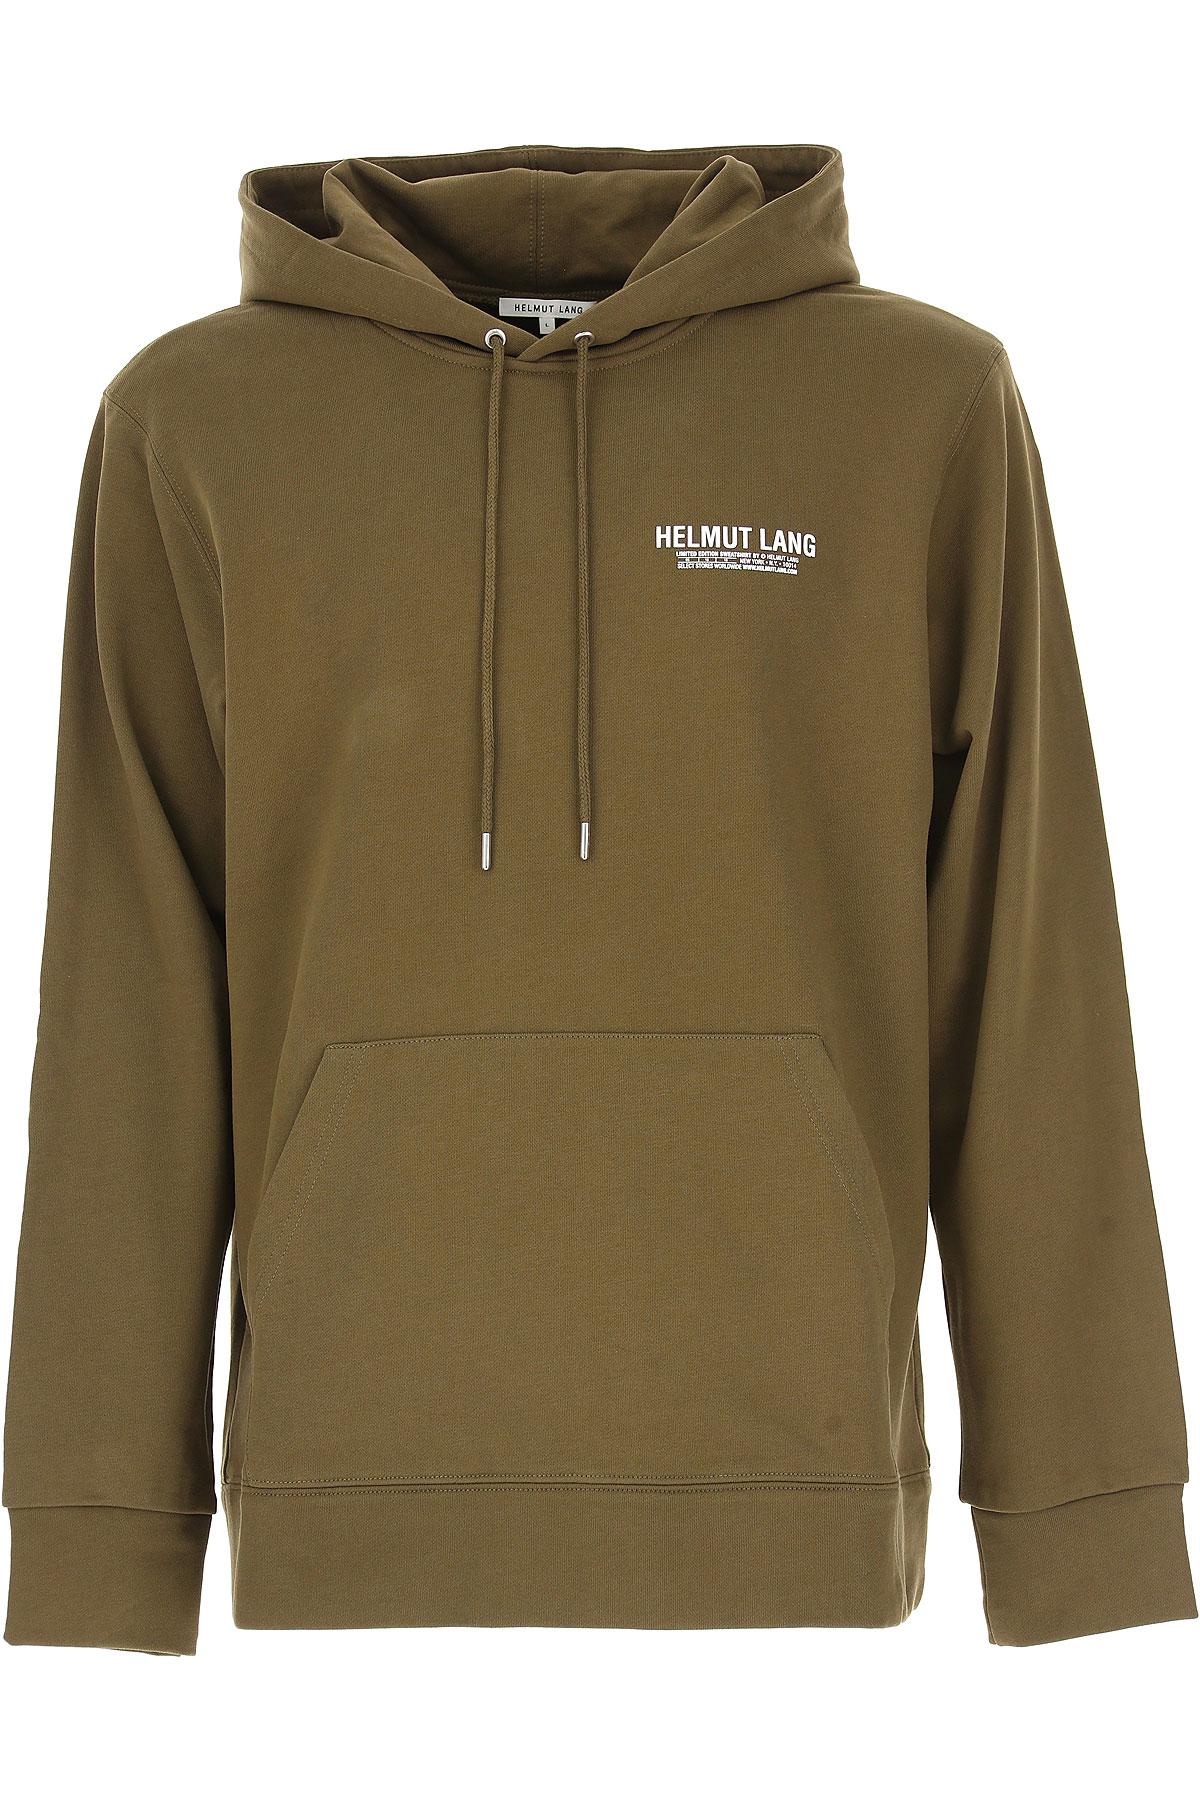 Image of Helmut Lang Sweatshirt for Men, Kaki, Cotton, 2017, L M